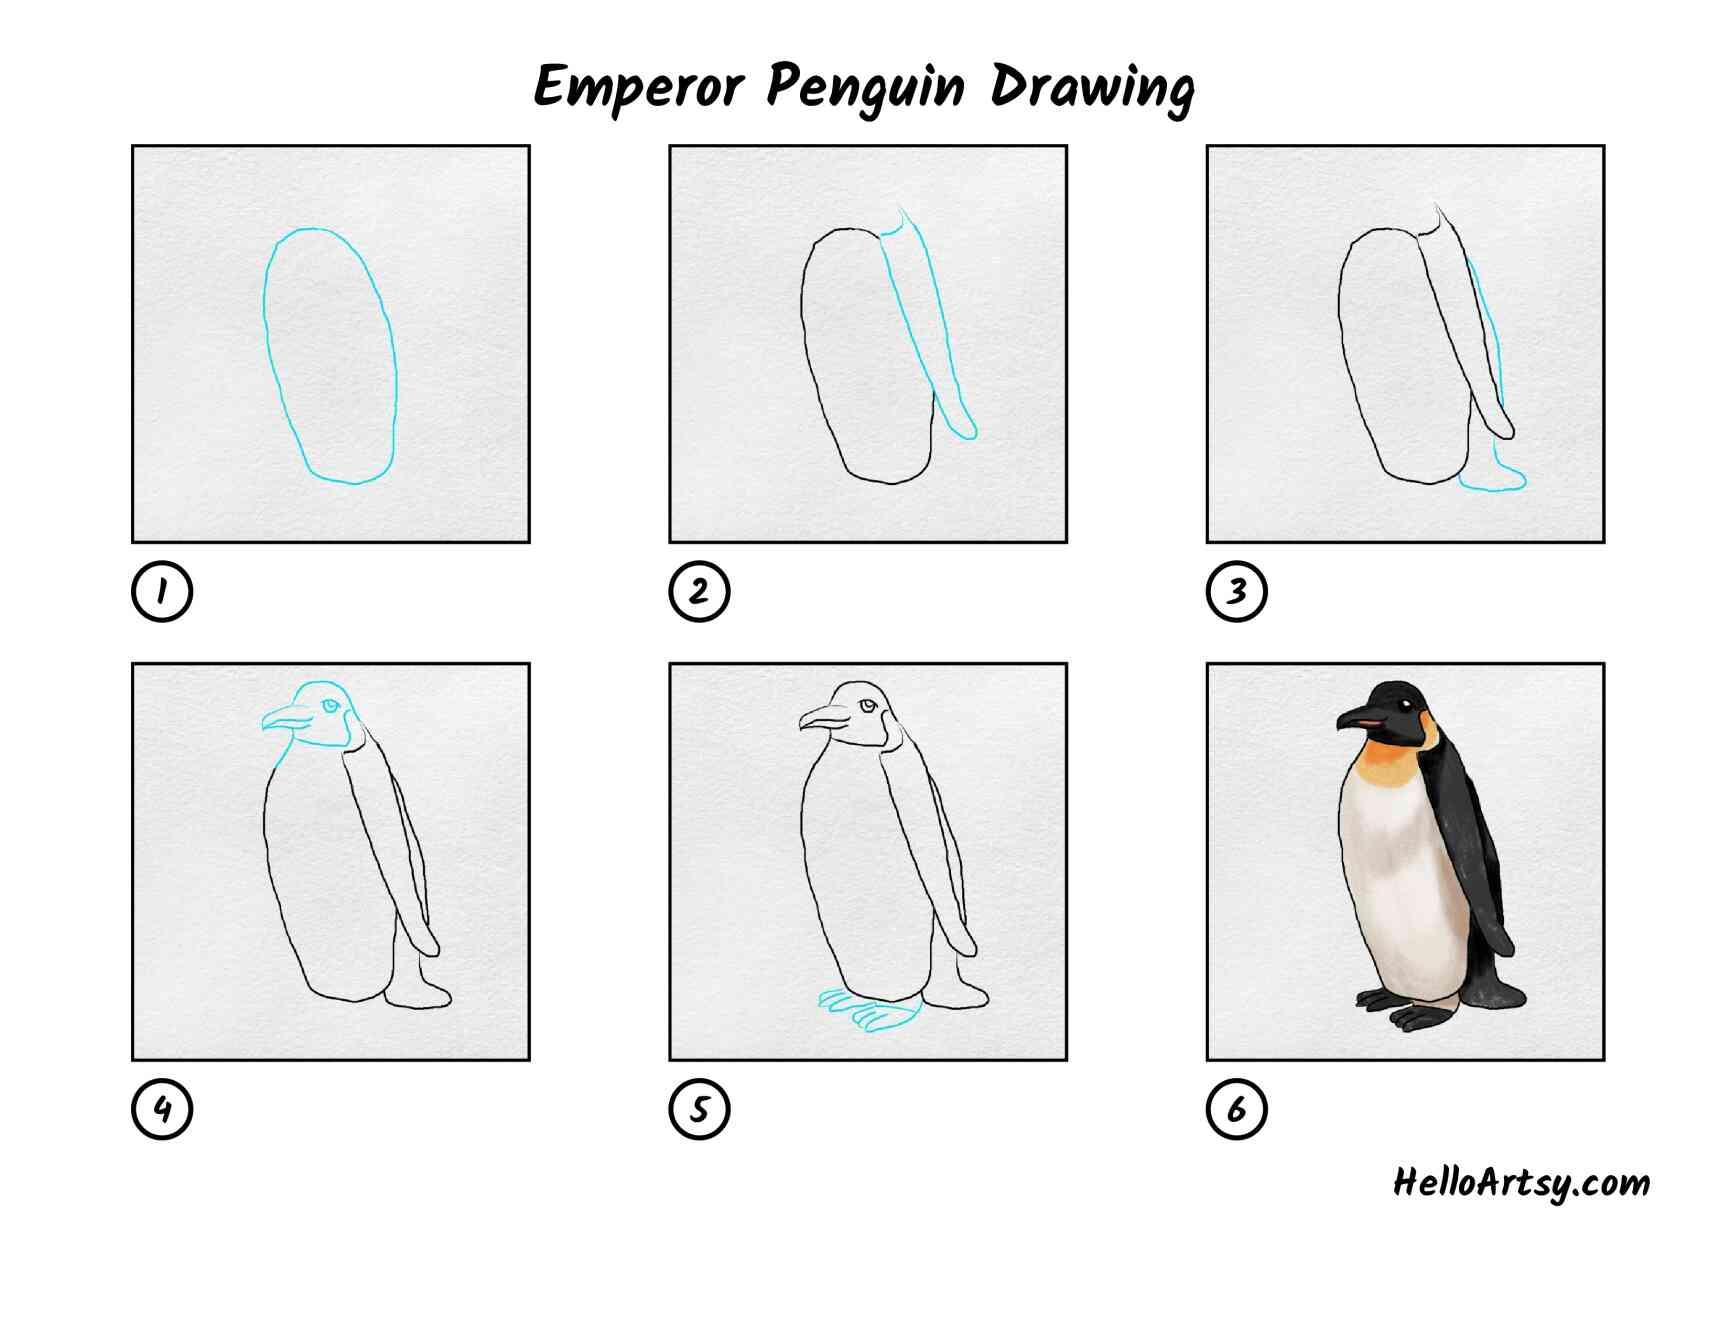 Emperor Penguin Drawing: All Steps